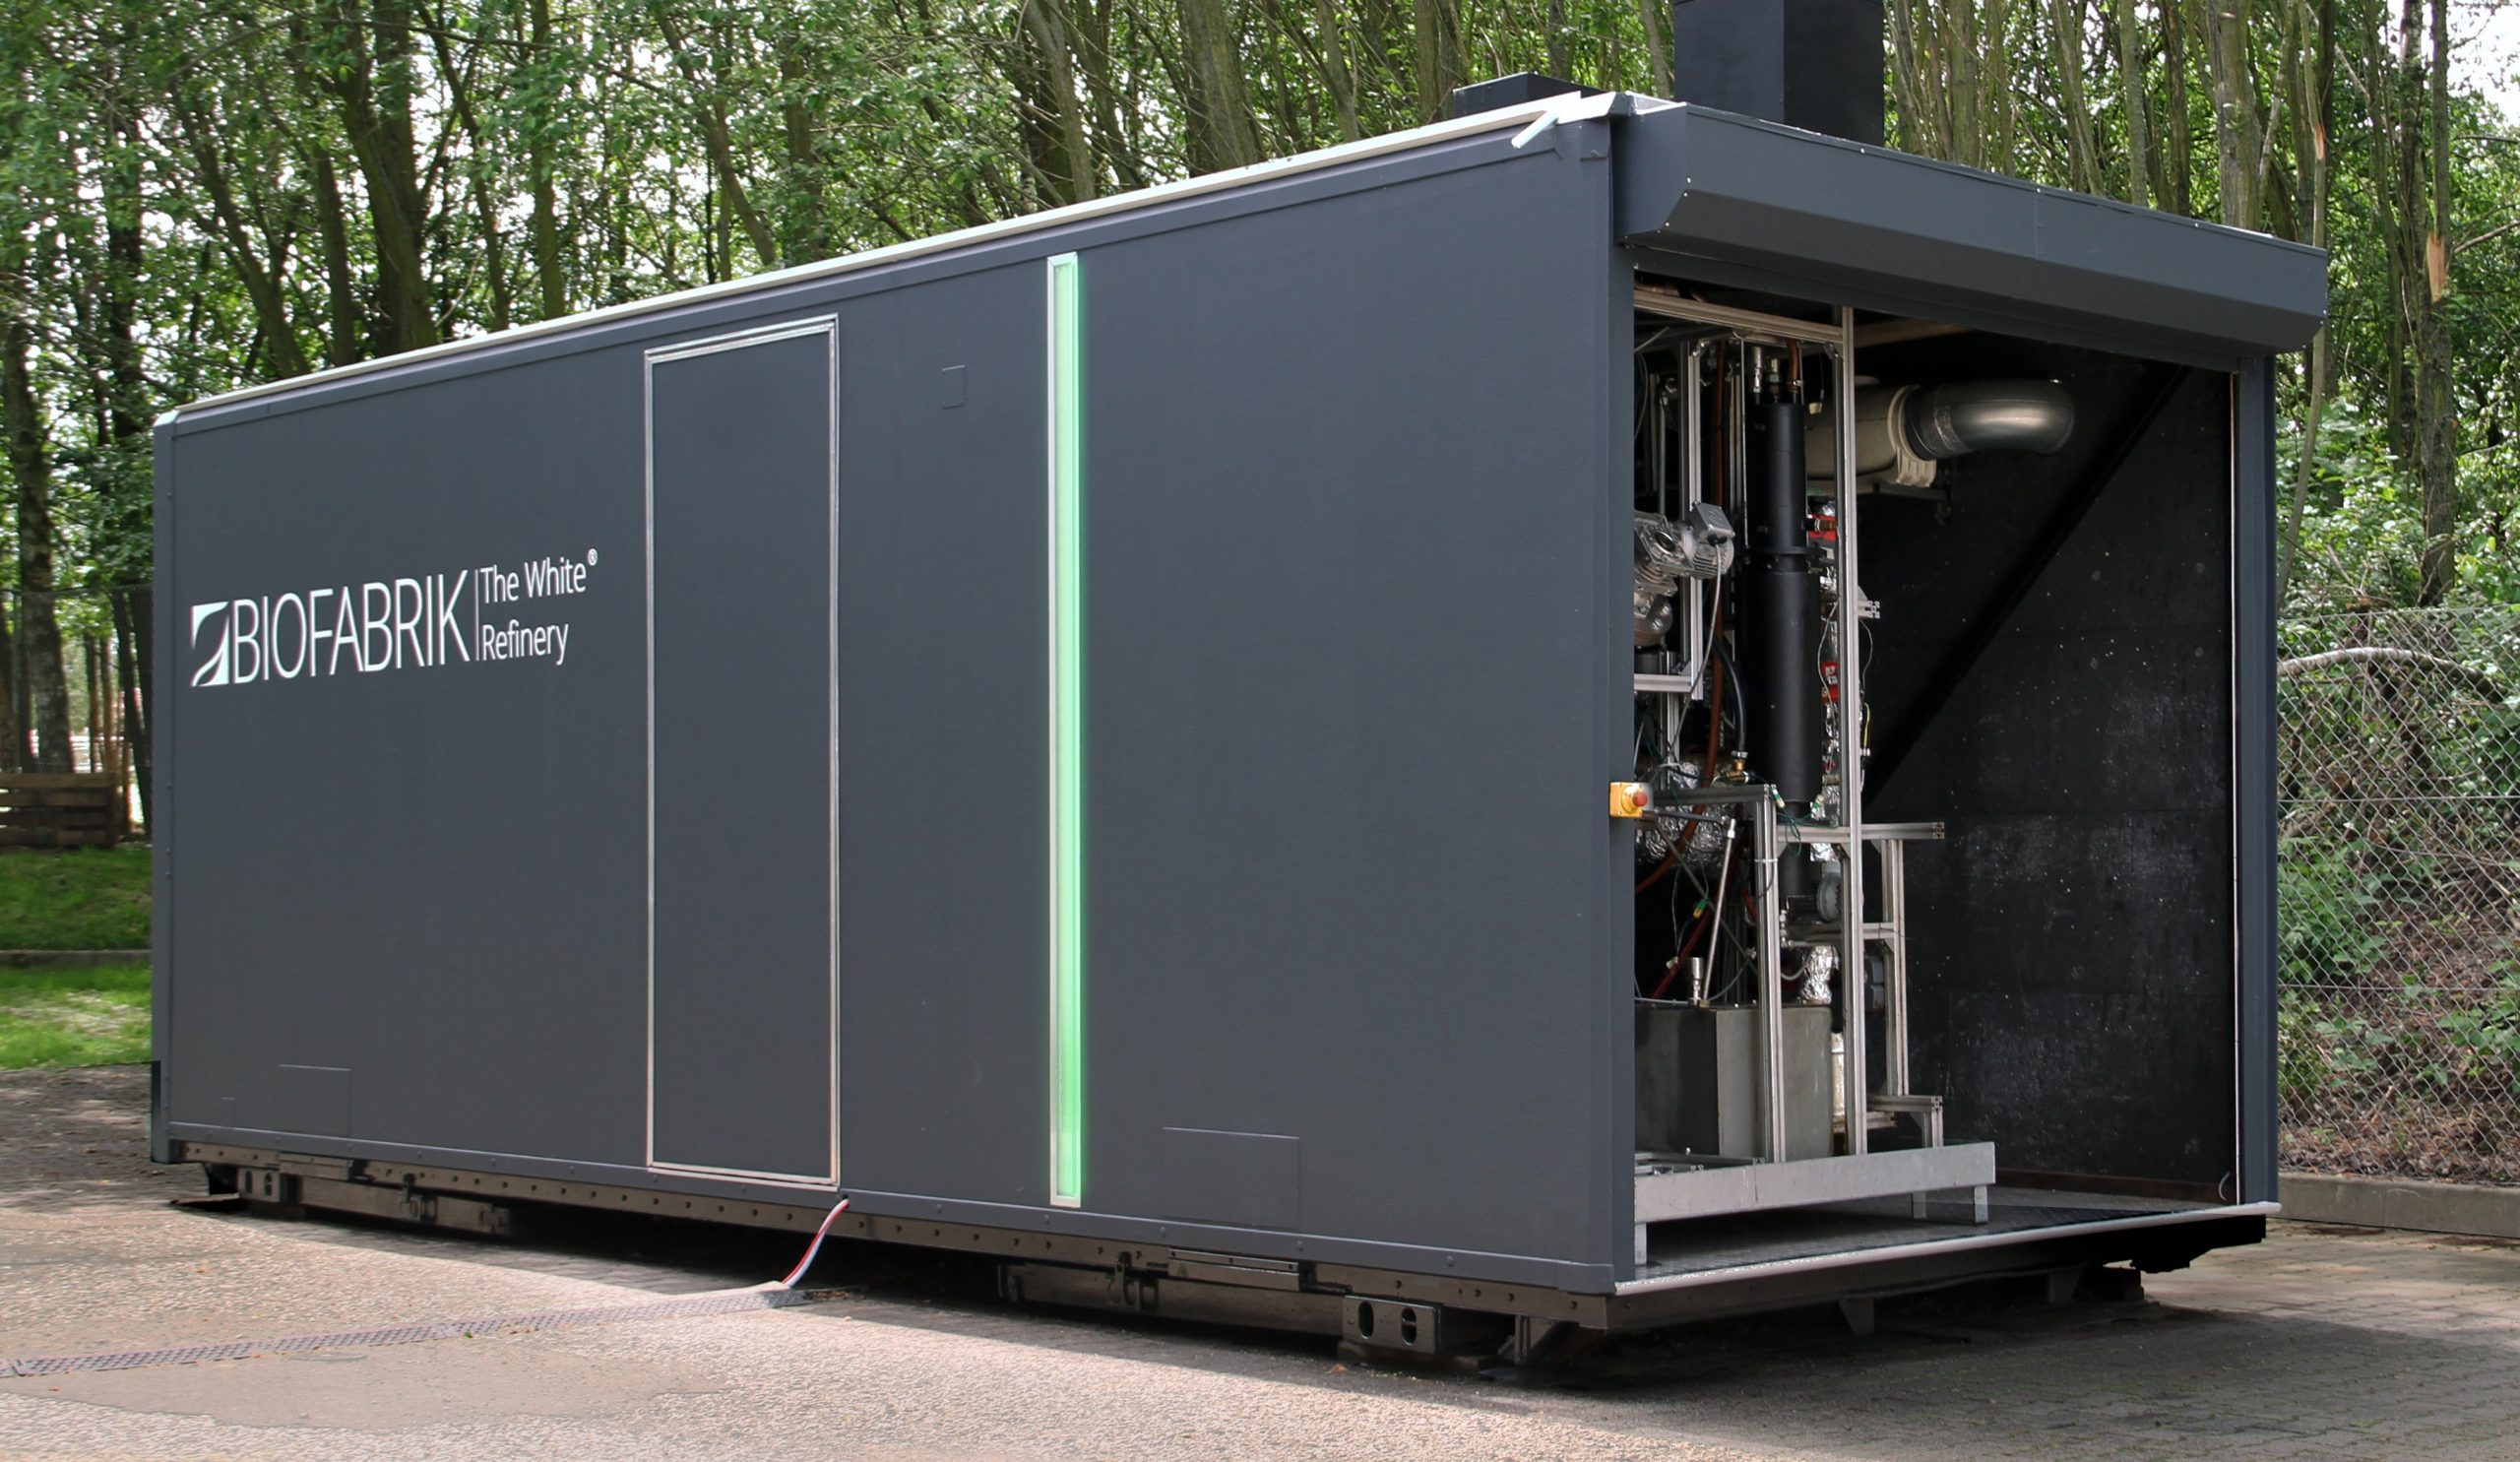 Biofabrik technologies turn plastic to energy